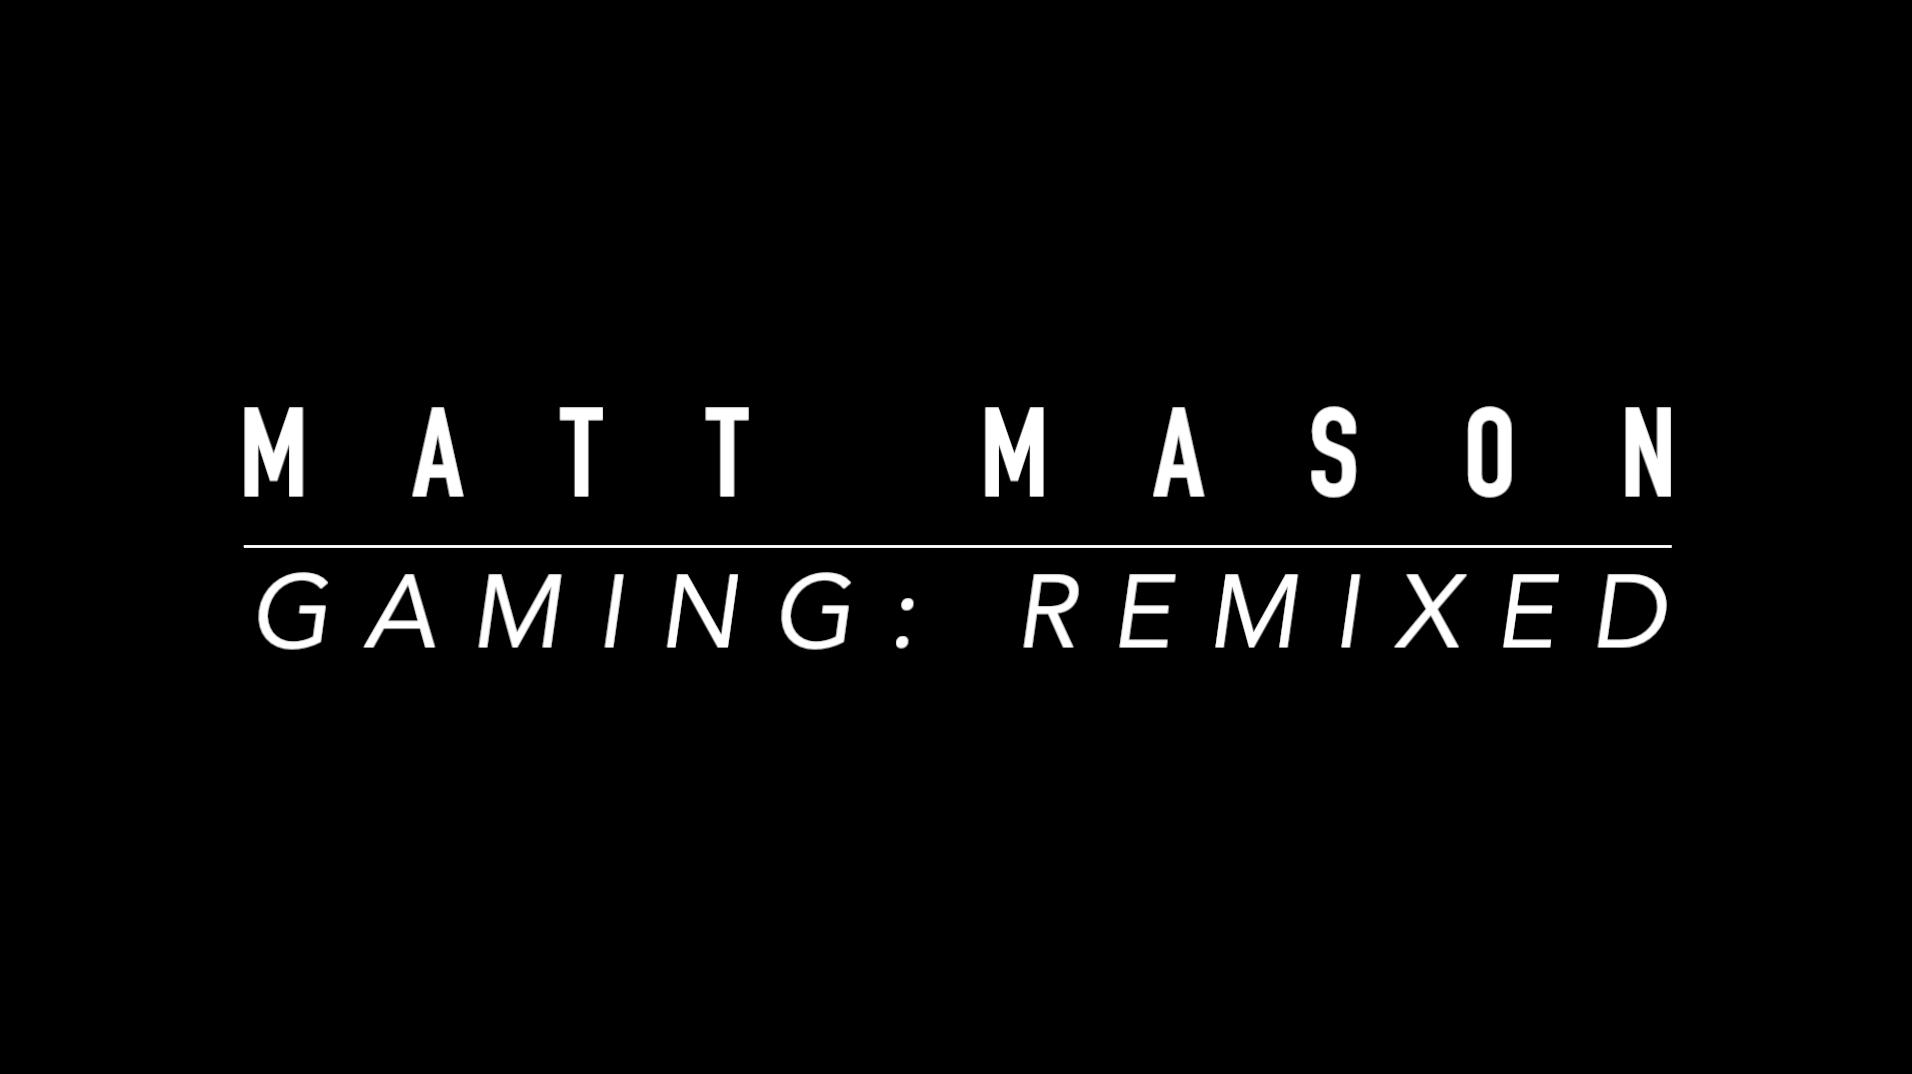 Matt Mason - Gaming remixed